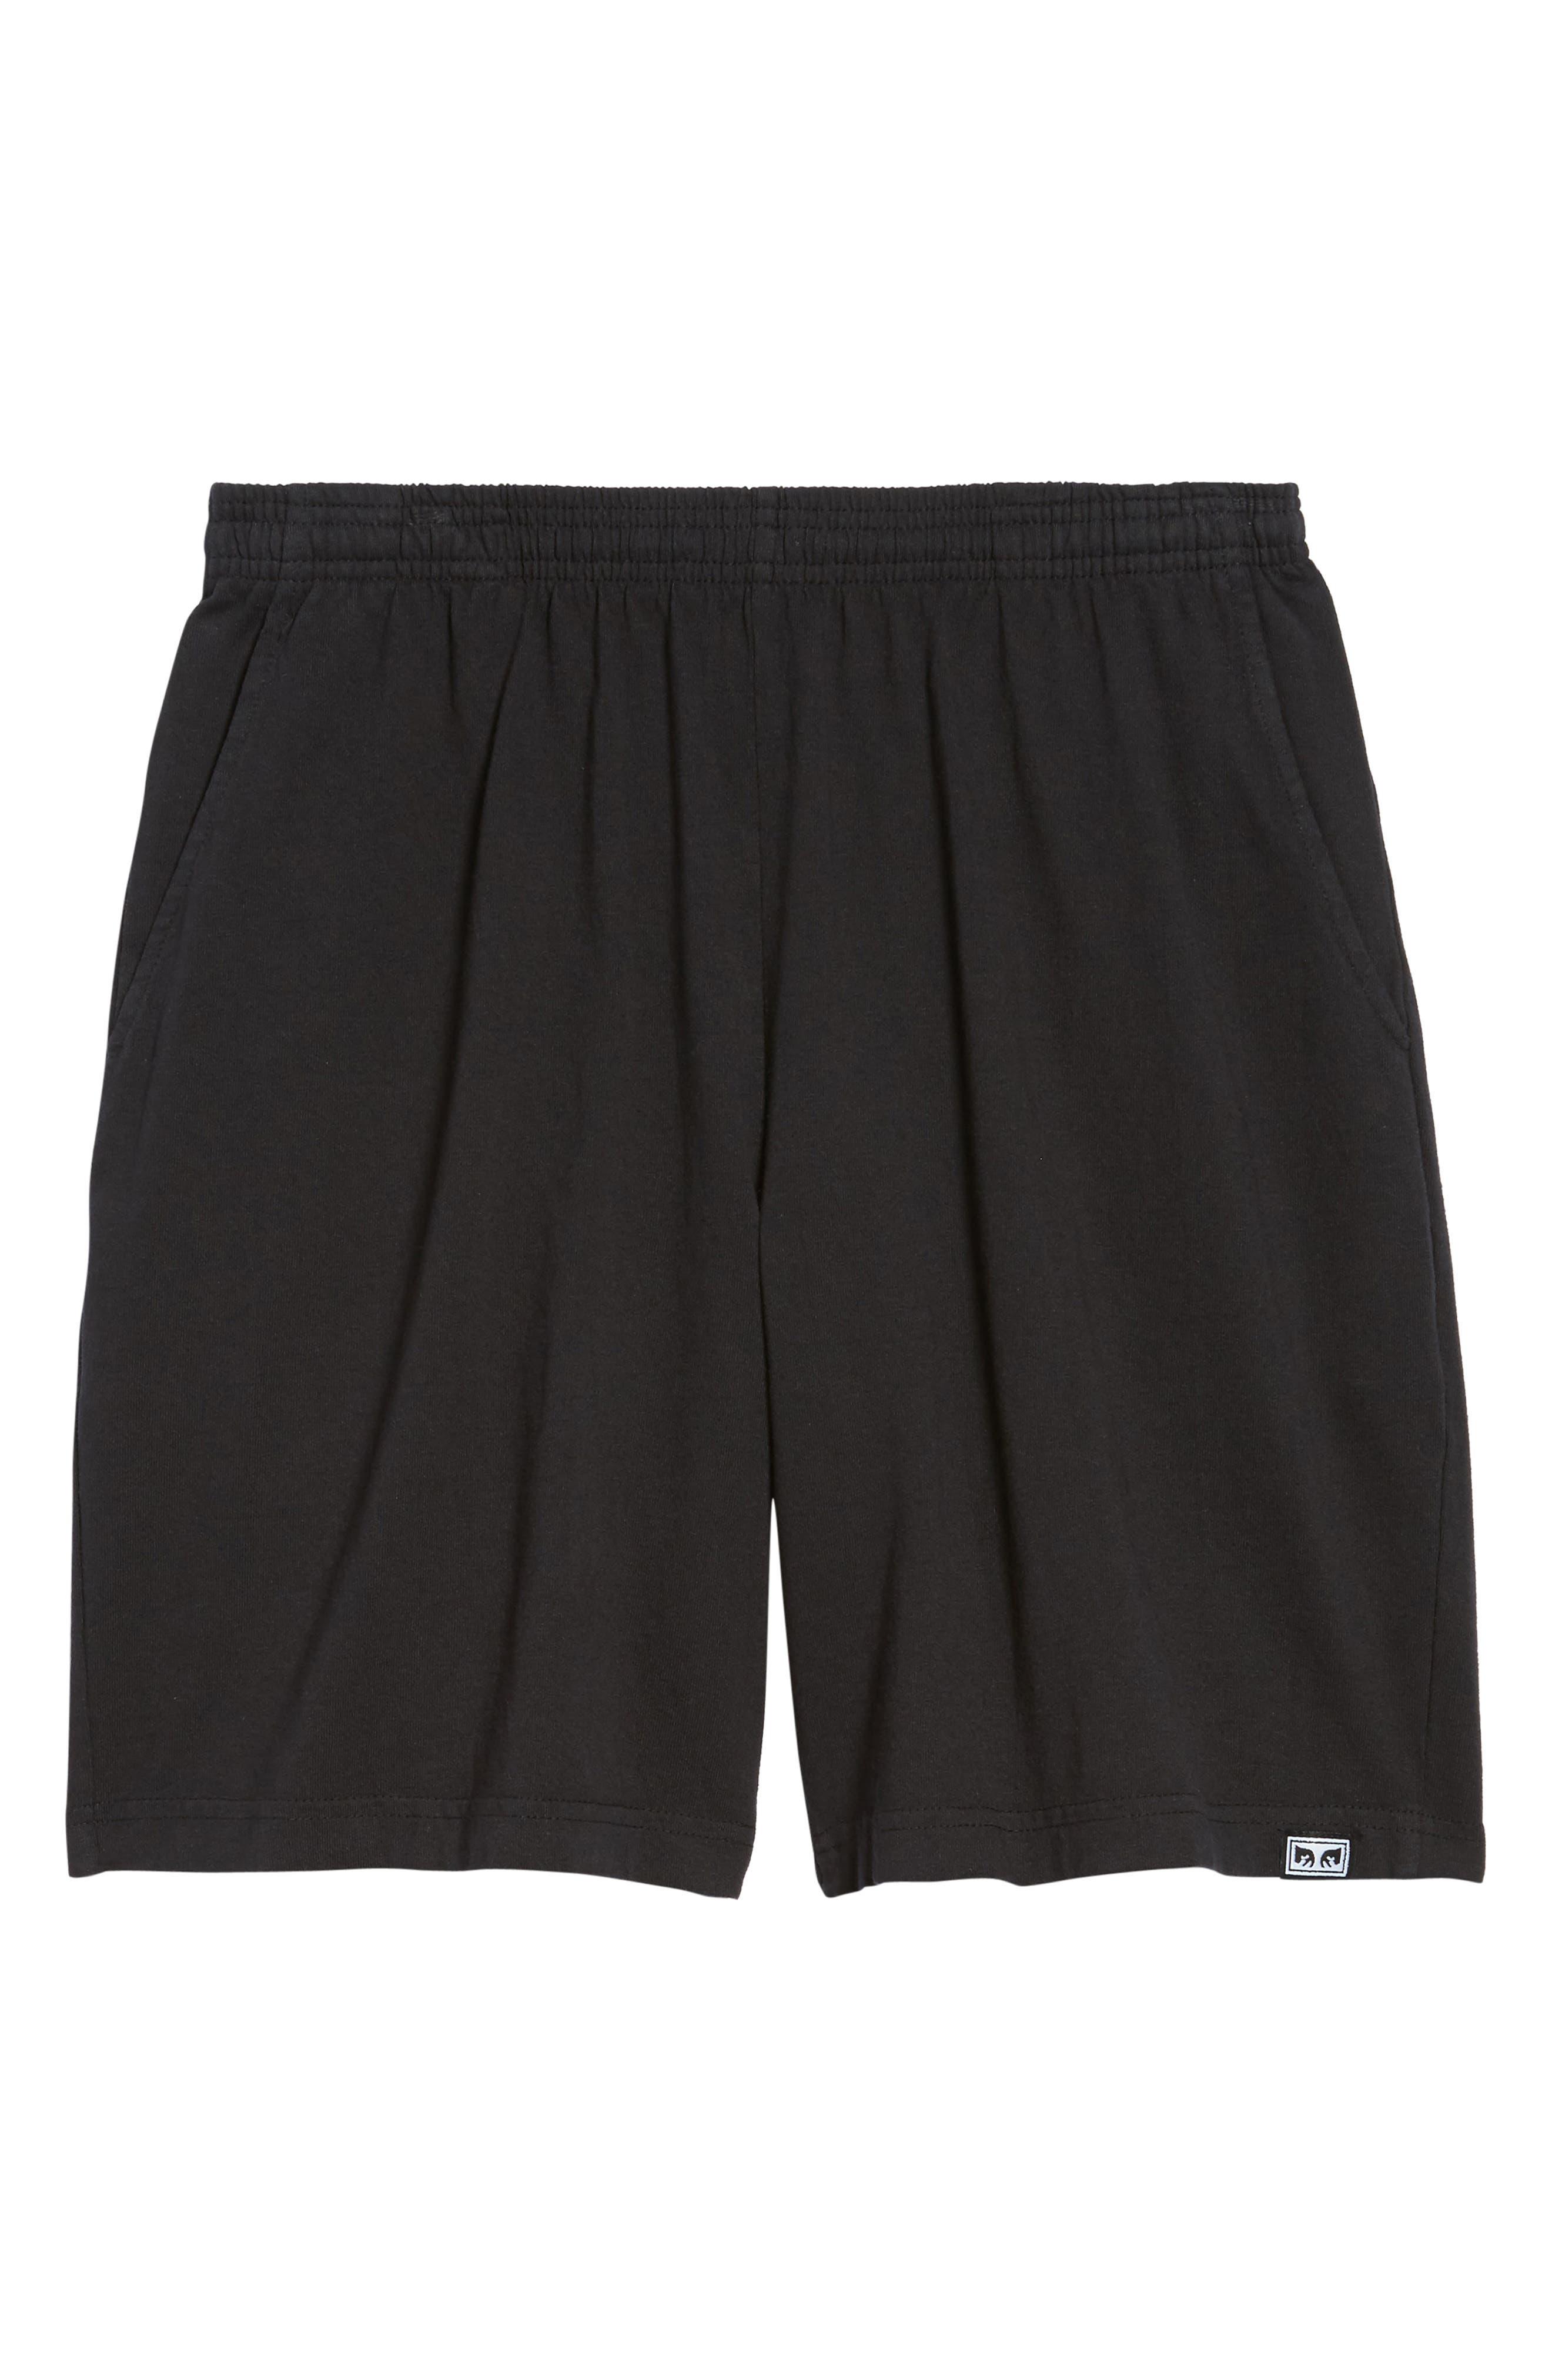 Eyes Heavyweight Sport Shorts,                             Alternate thumbnail 6, color,                             001